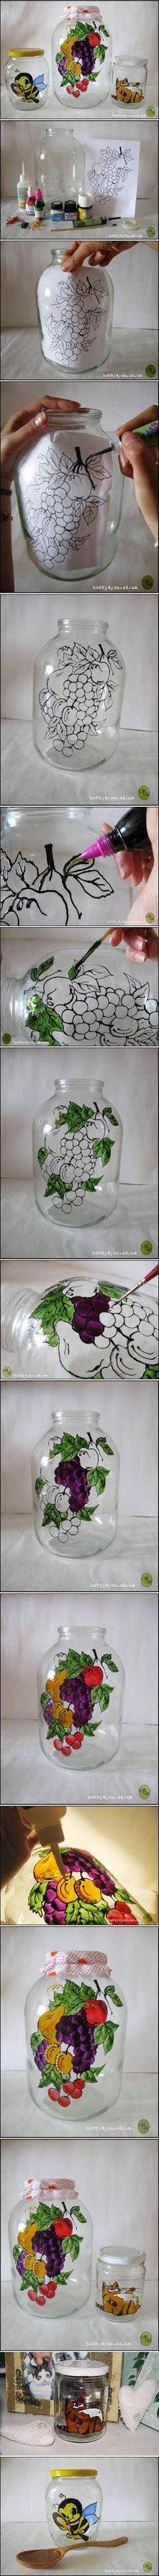 DIY Jar Painting Decor by Lorett